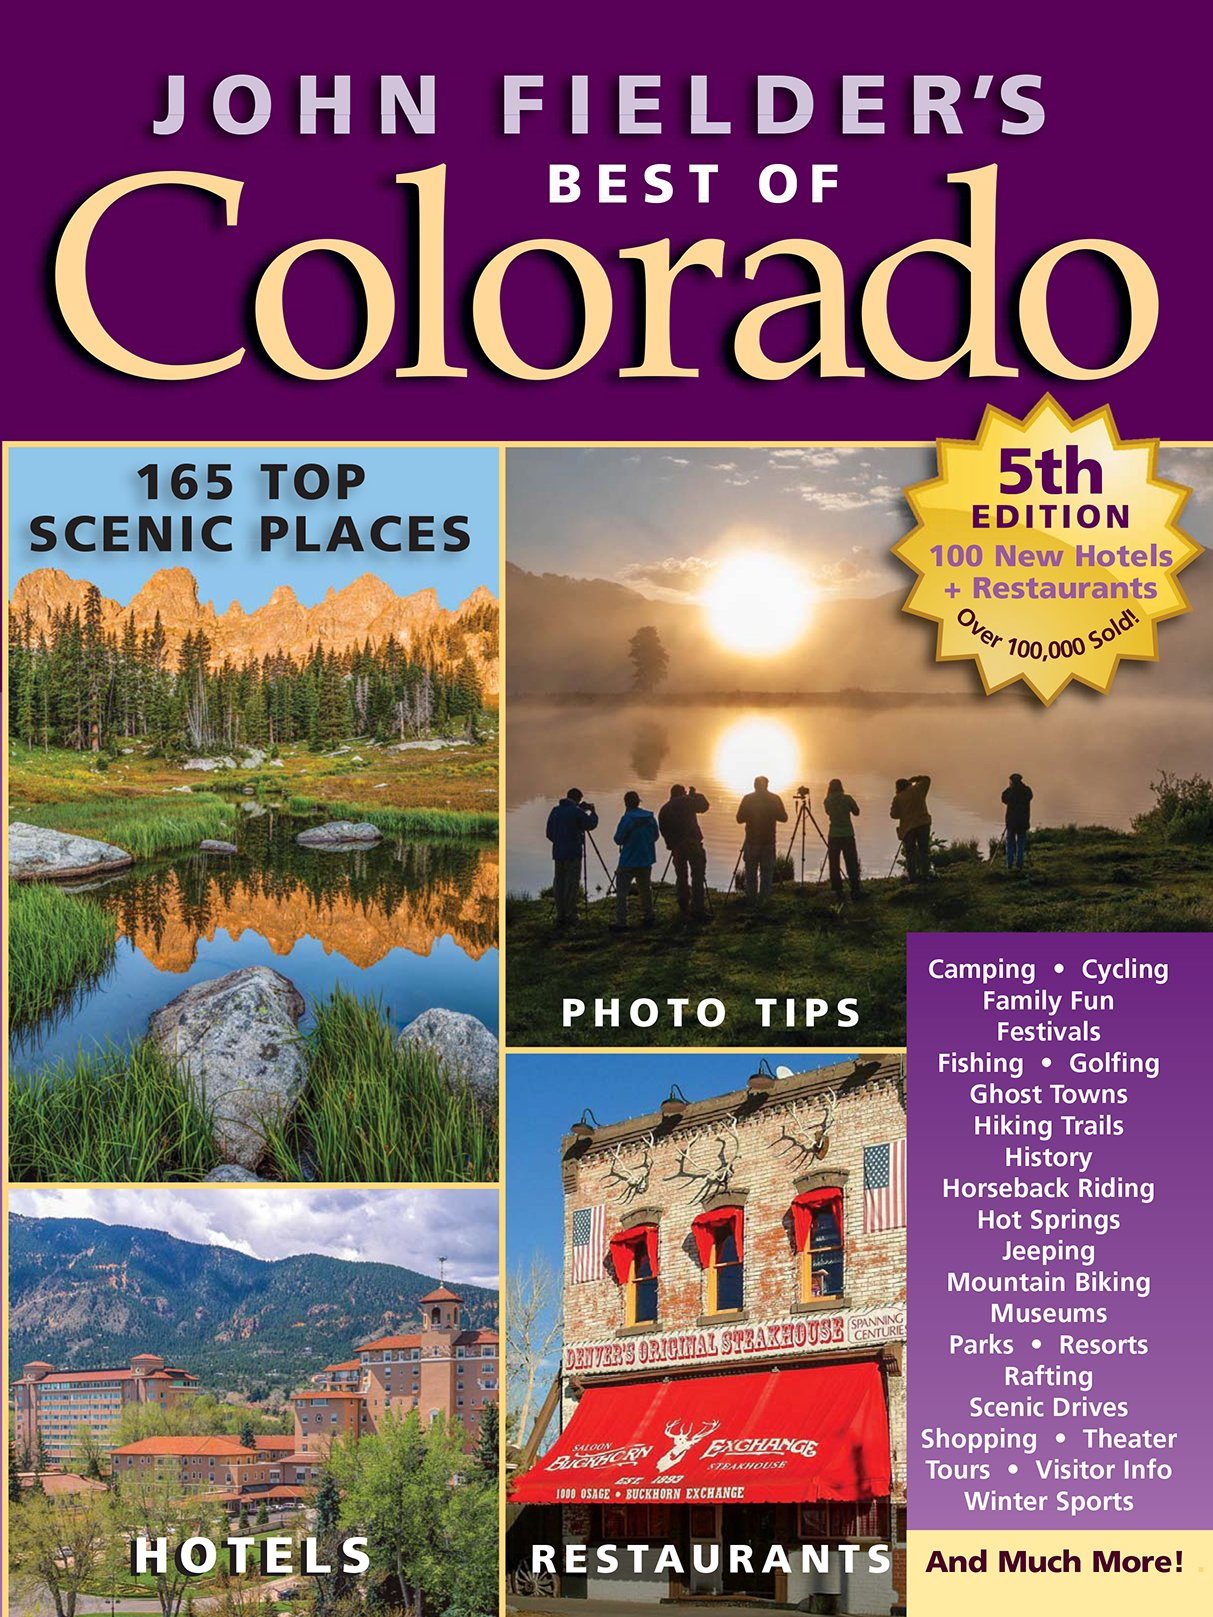 Download John Fielder's Best of Colorado, 5th Edition ebook